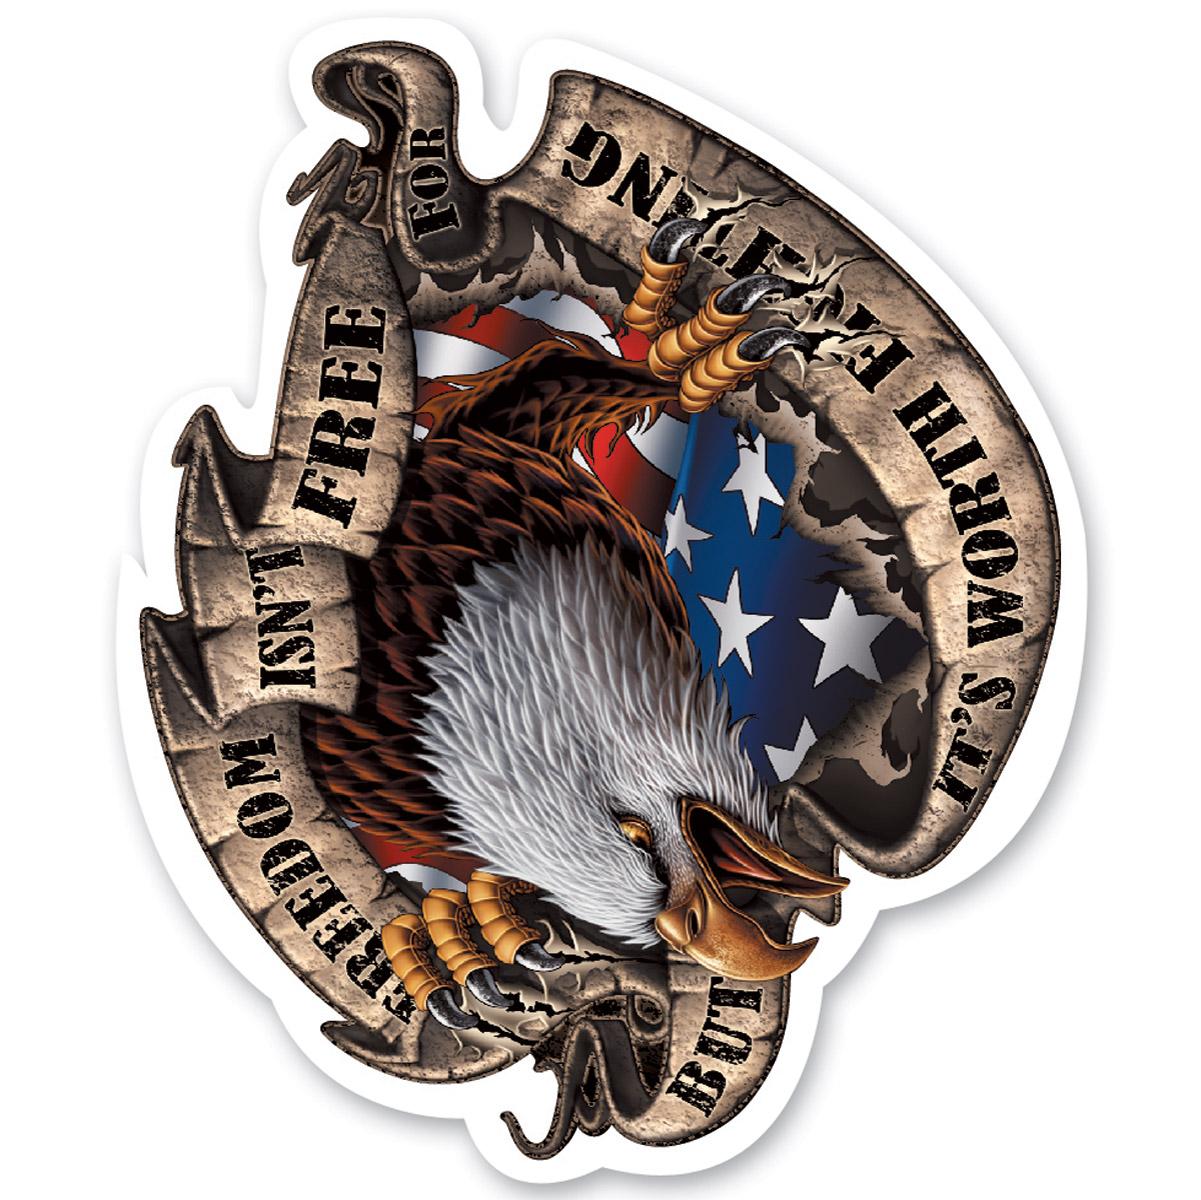 Lethal Threat Rude & Crude Freedom Eagle Mini Decal